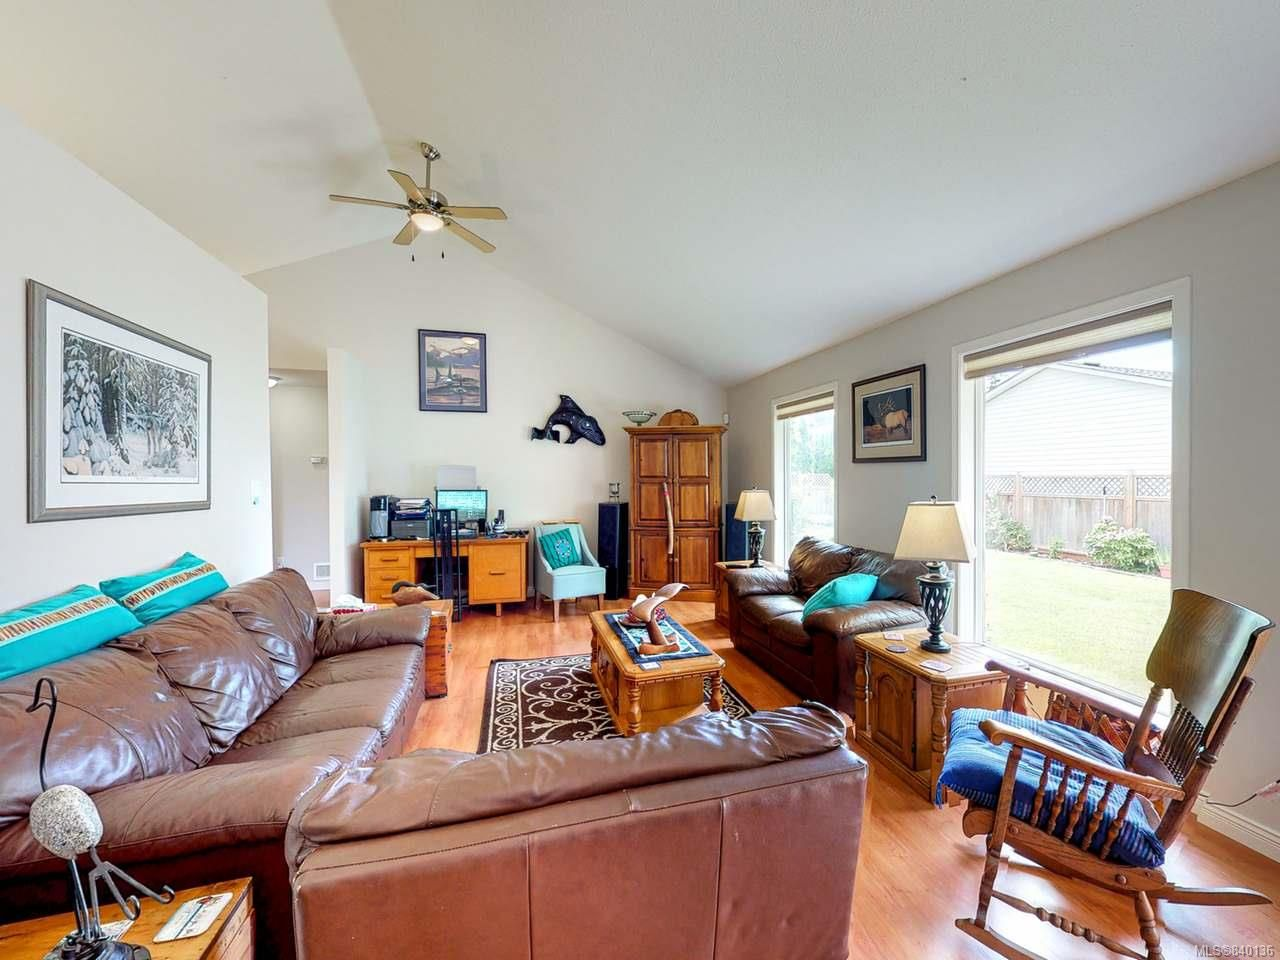 Photo 13: Photos: 5484 W Woodland Cres in PORT ALBERNI: PA Port Alberni House for sale (Port Alberni)  : MLS®# 840136